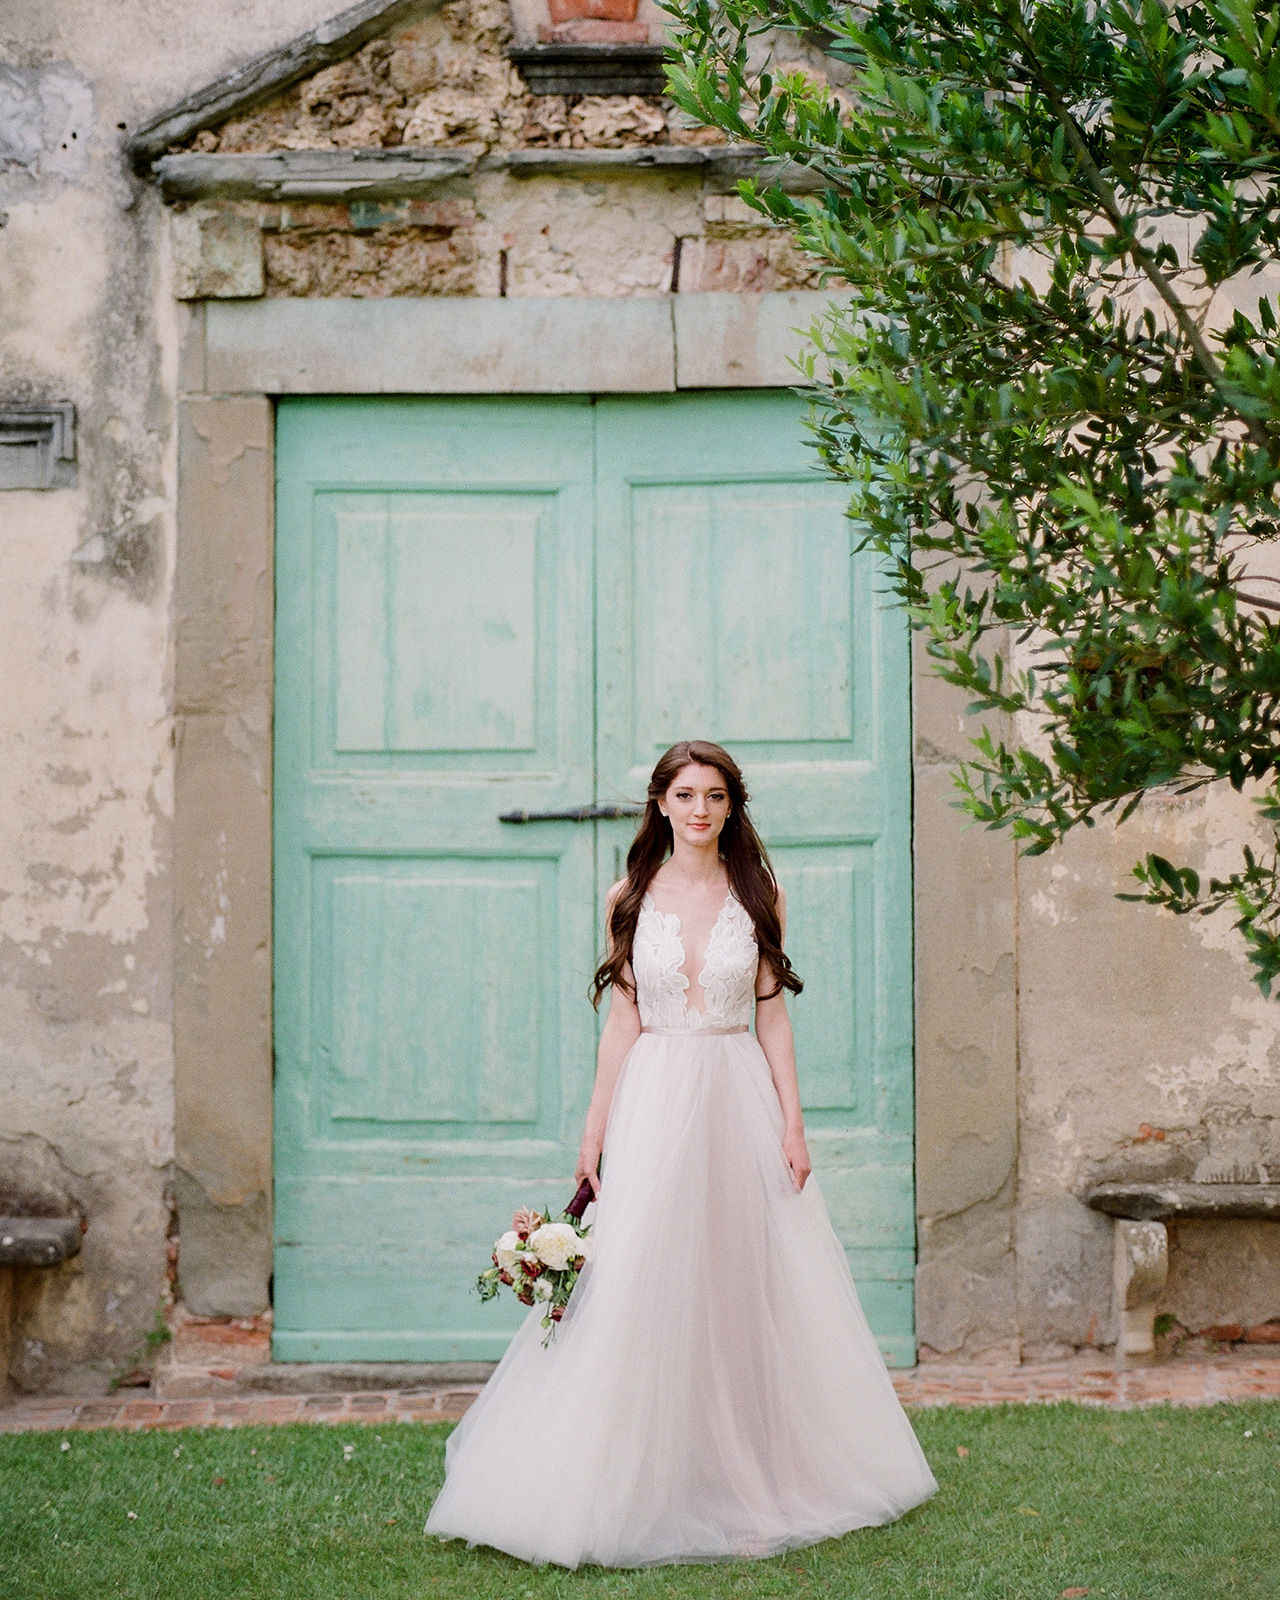 brides chiffon wedding dress v-beck belt